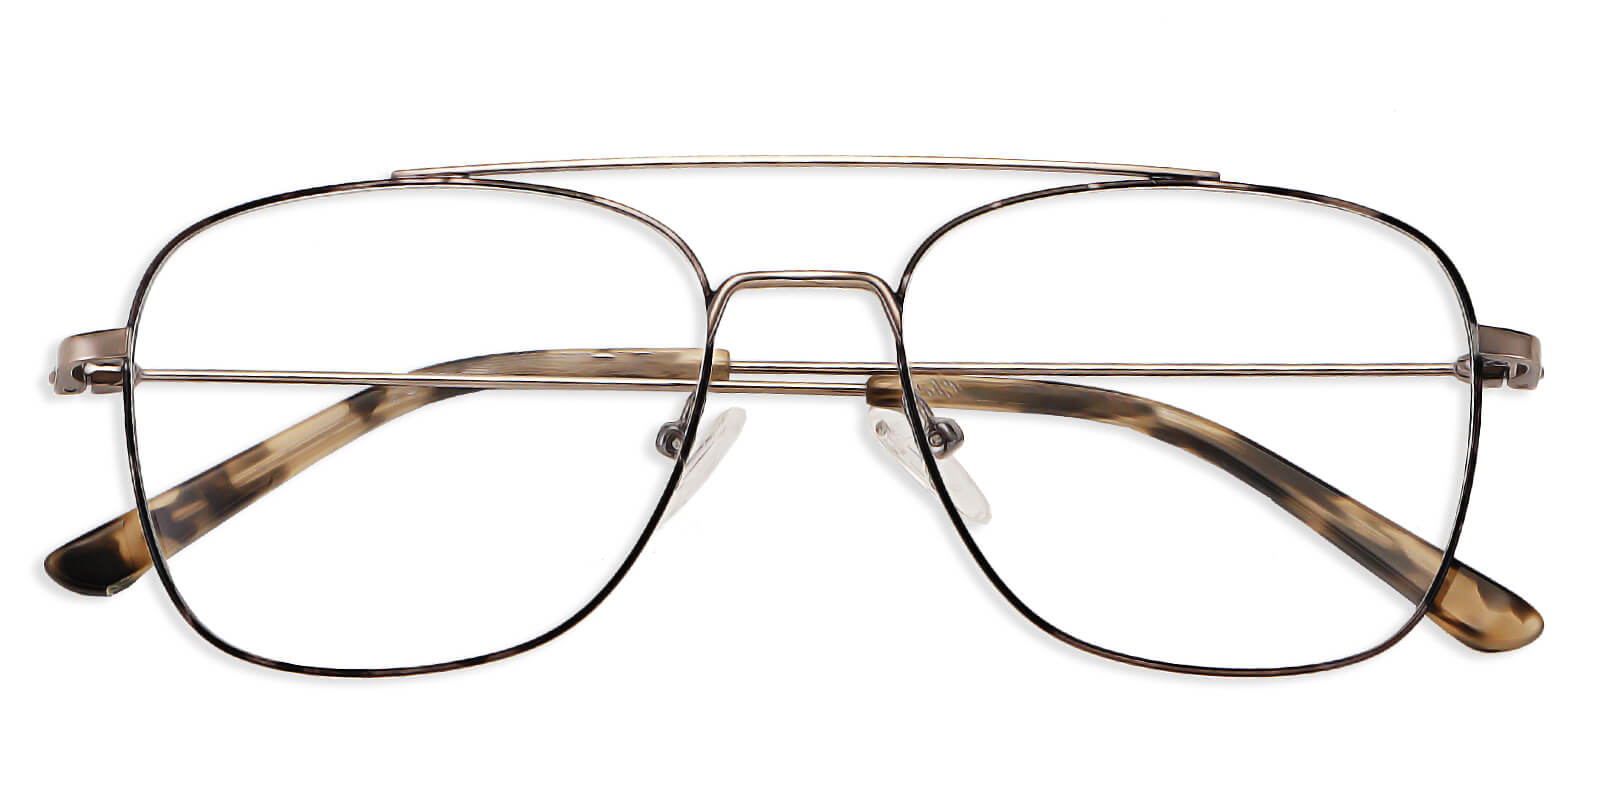 Daryl-Aviator classic glasses : square super-light metal design